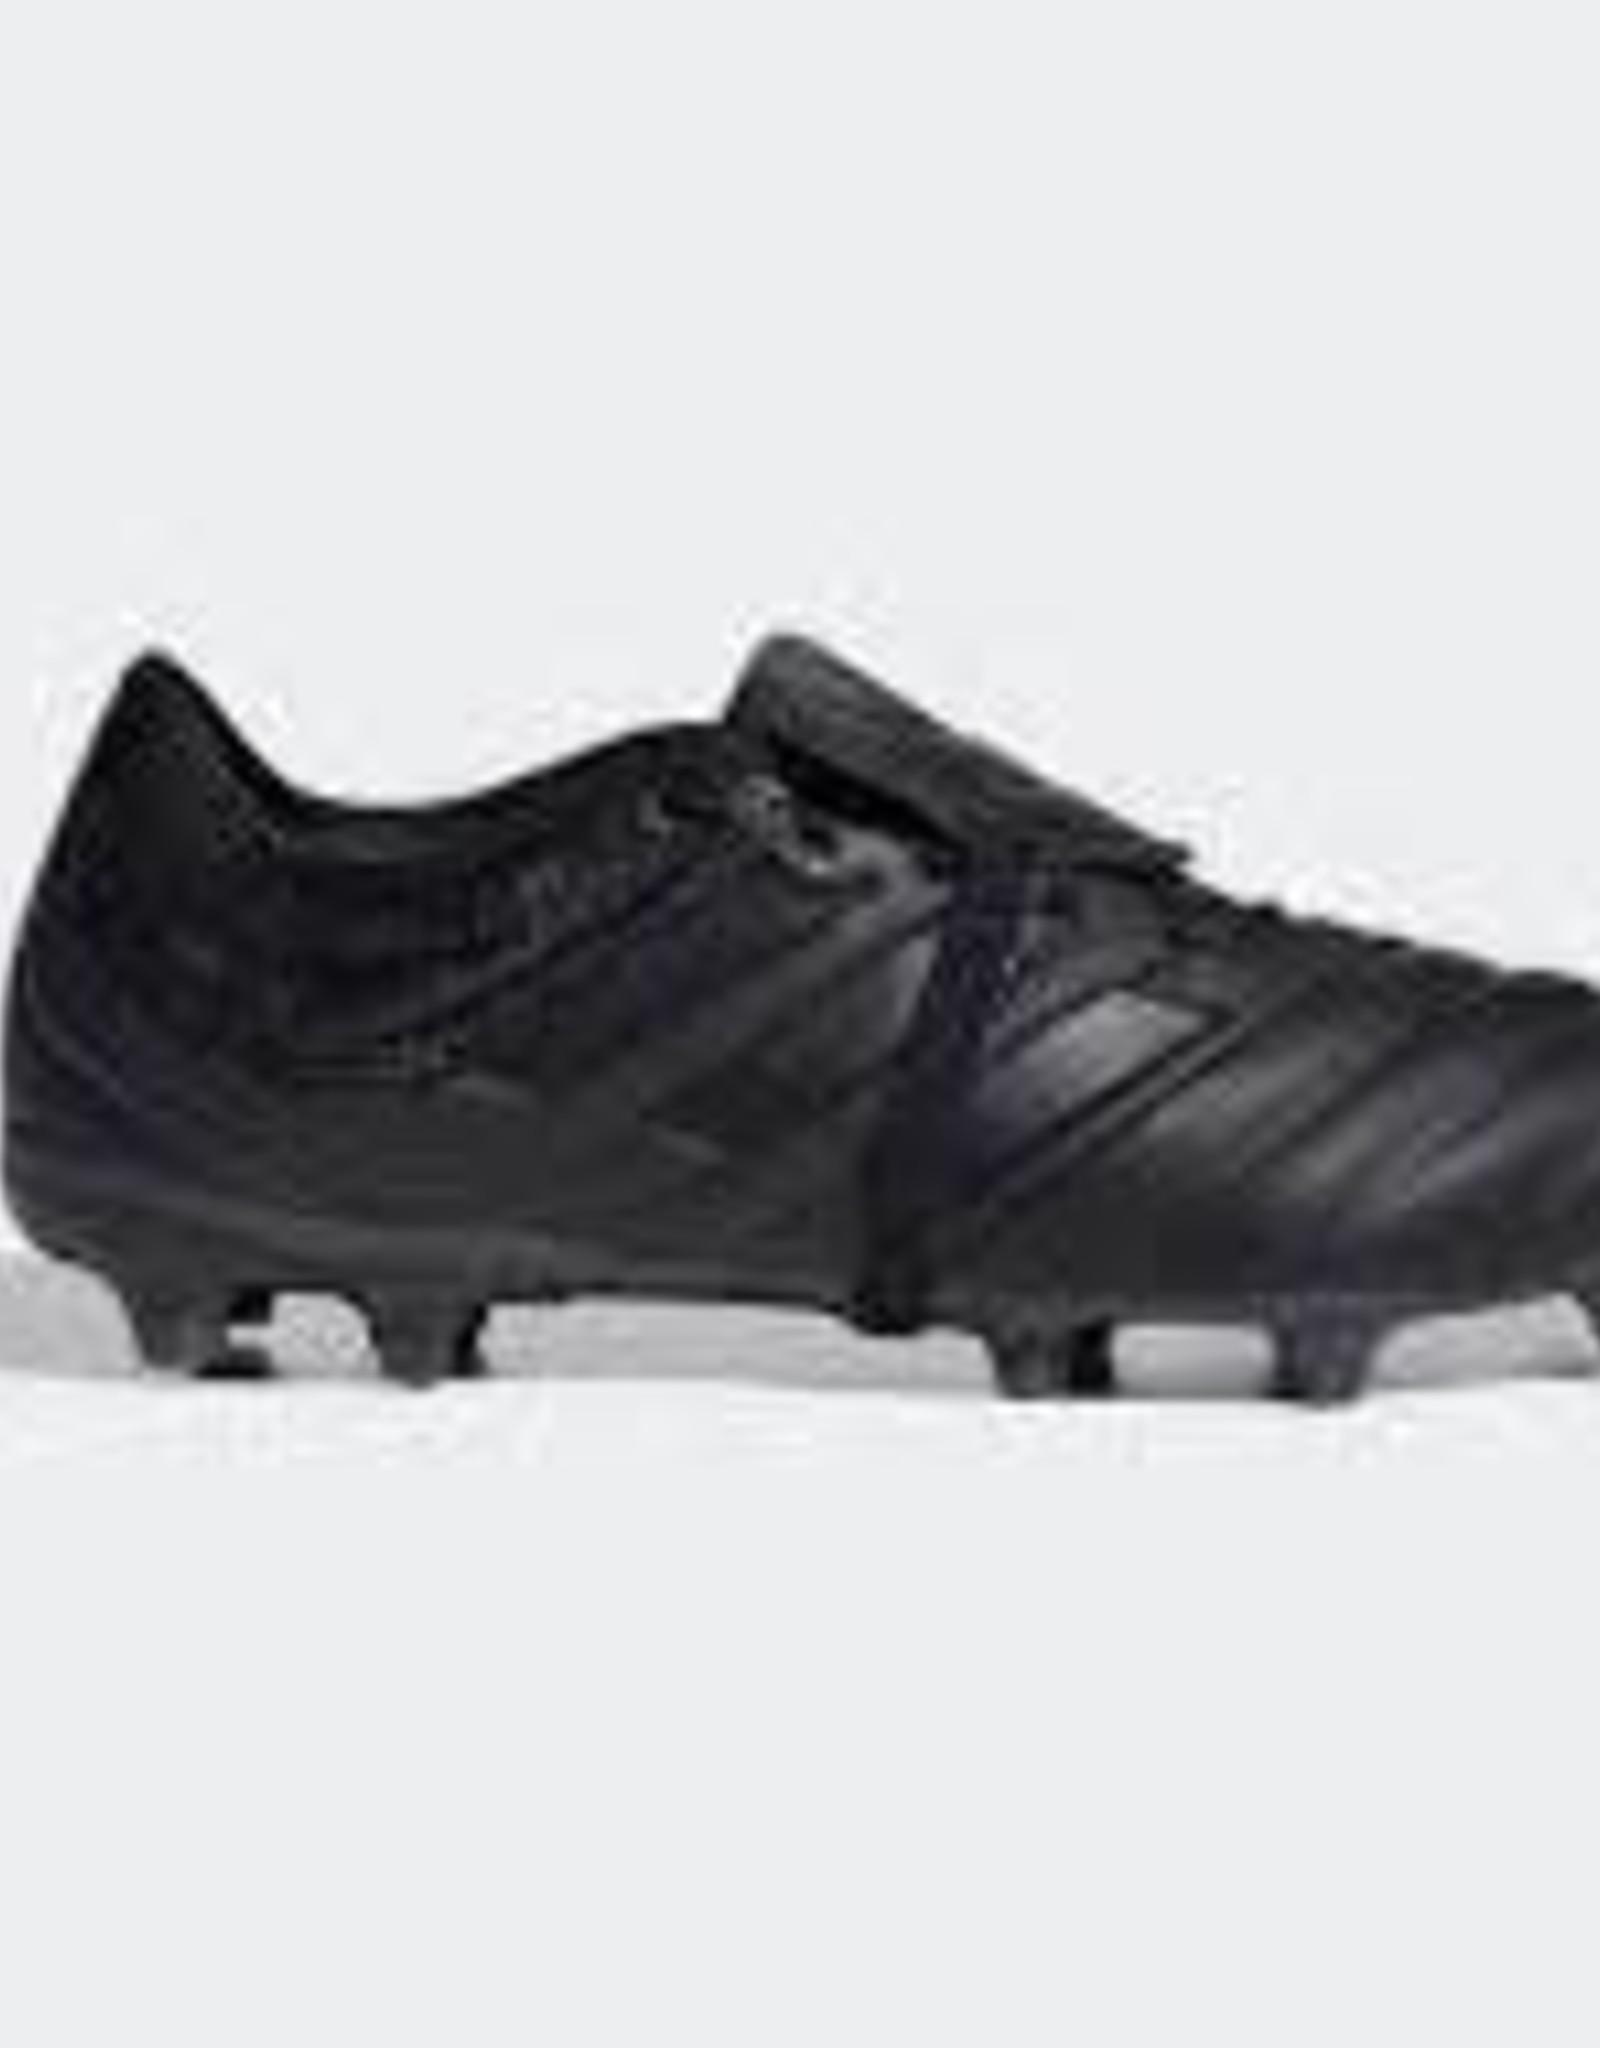 Adidas copa gloro 20.2  fg zwart